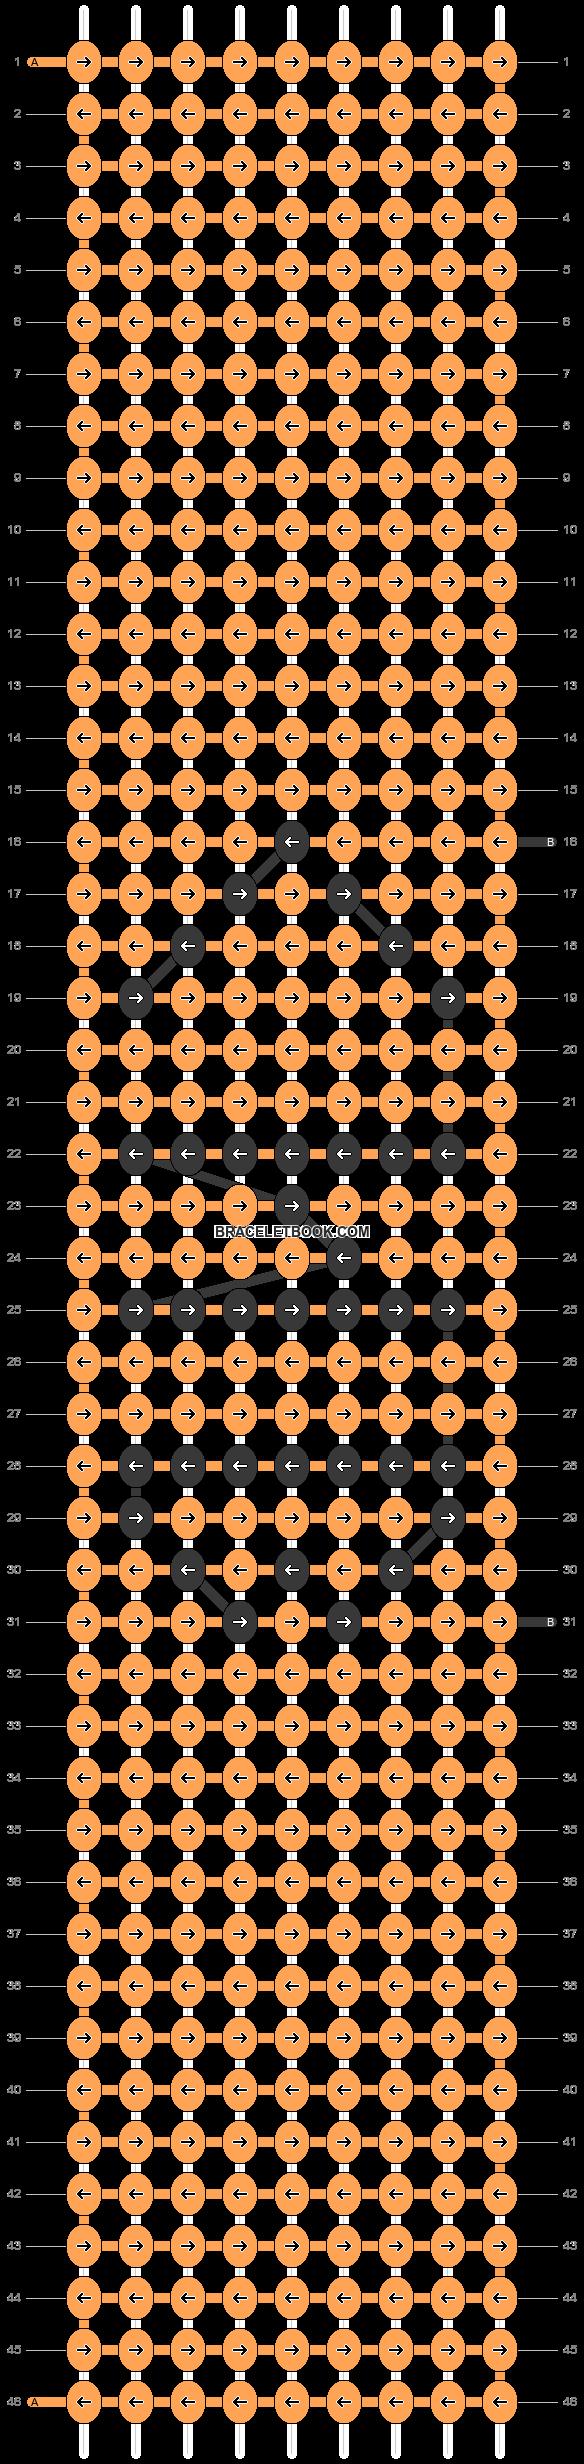 Alpha pattern #18289 pattern